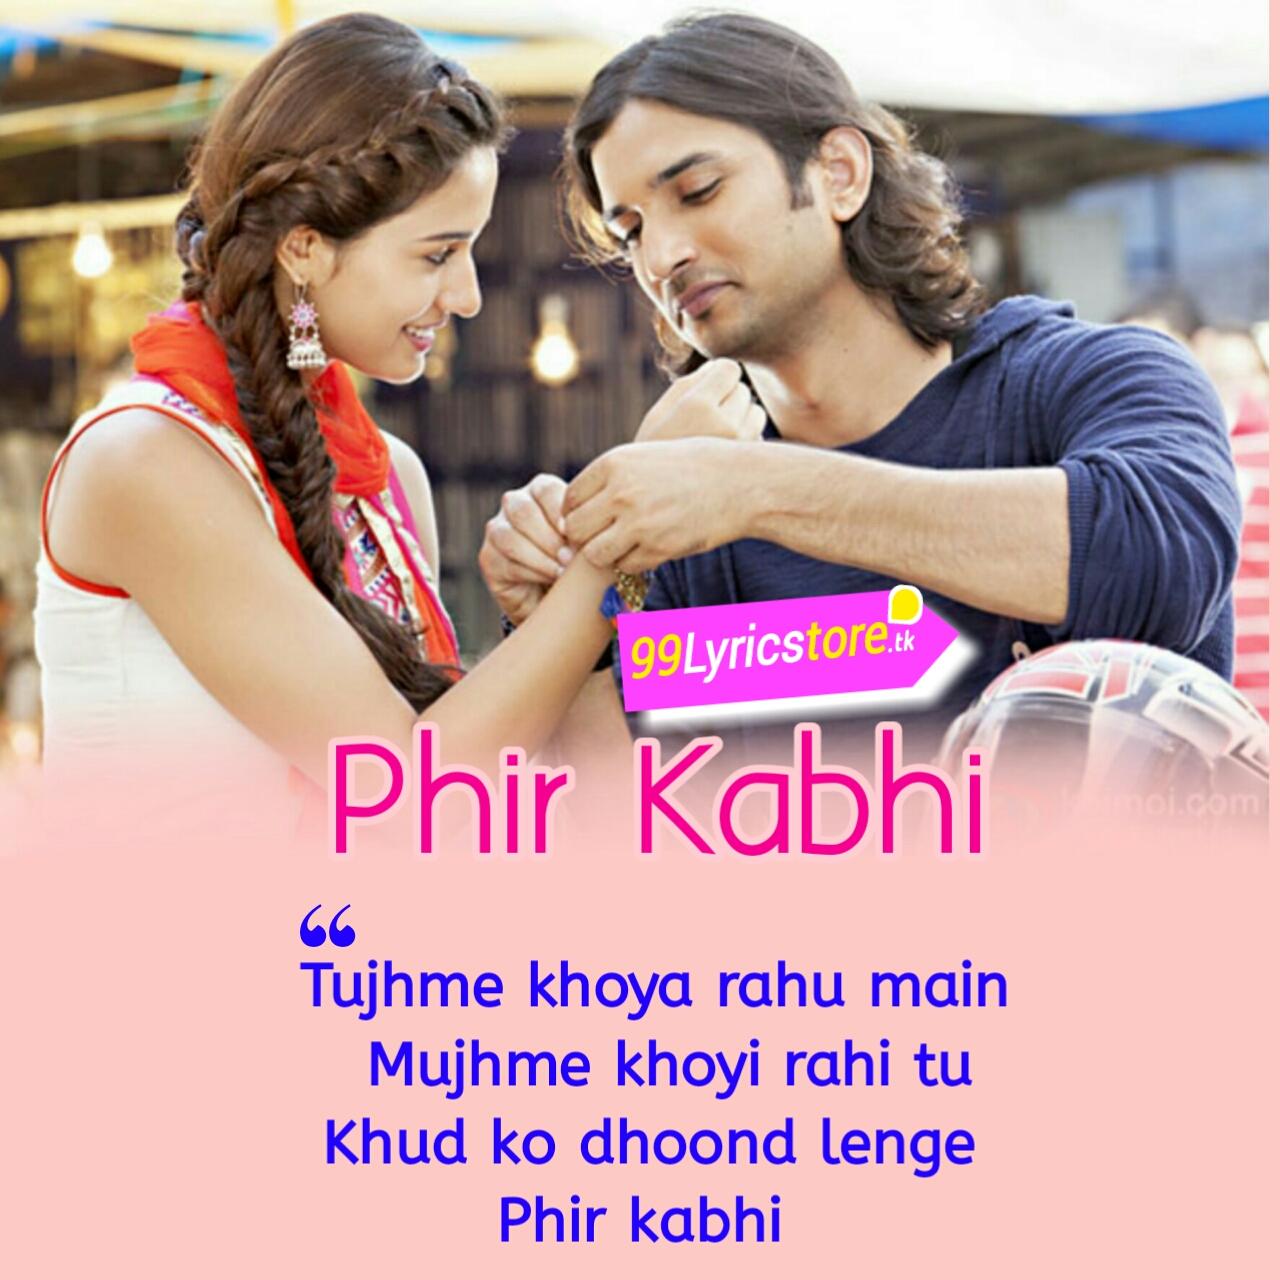 Arijit Singh Song Lyrics, Disha Patani Images, Shushant Singh Rajput Song Lyrics, Love Quotes in Hindi, Top Bollywood movie Song Lyrics, Top Arijit Singh Song Lyrics, Hindi Song Lyrics